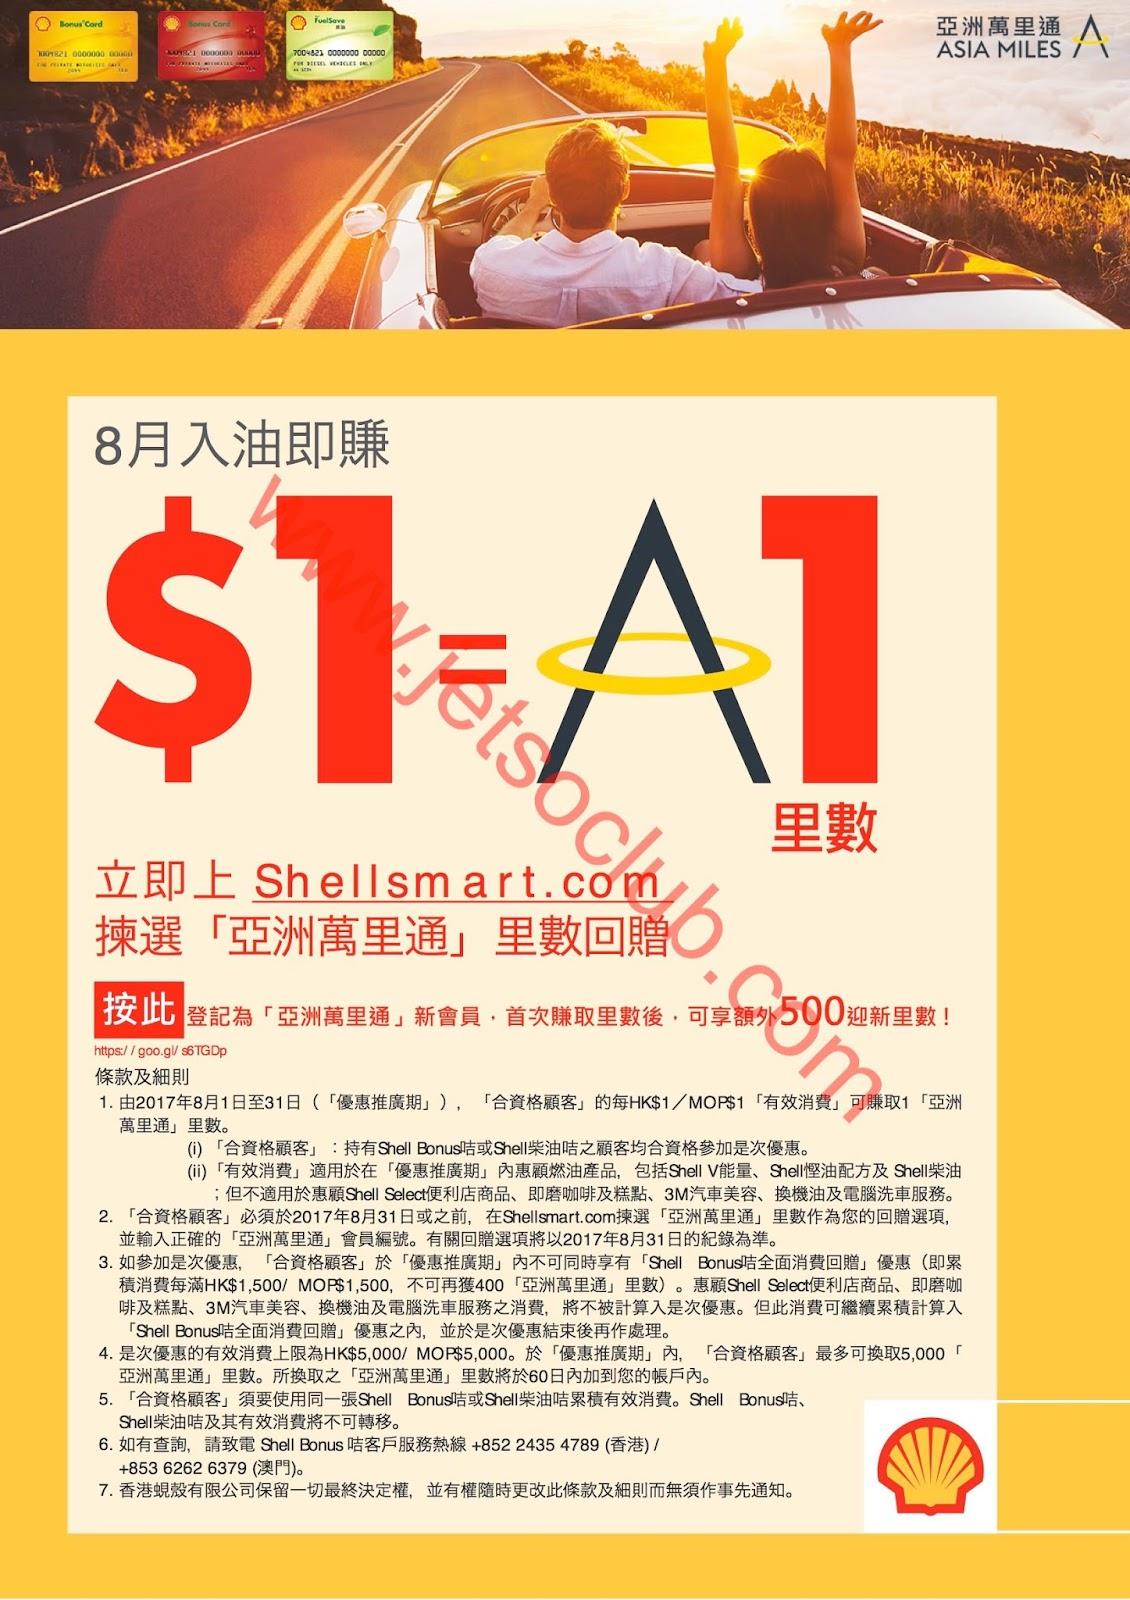 Shell:入油每$1 賺 1「亞洲萬里通」里數(1-31/8) ( Jetso Club 著數俱樂部 )